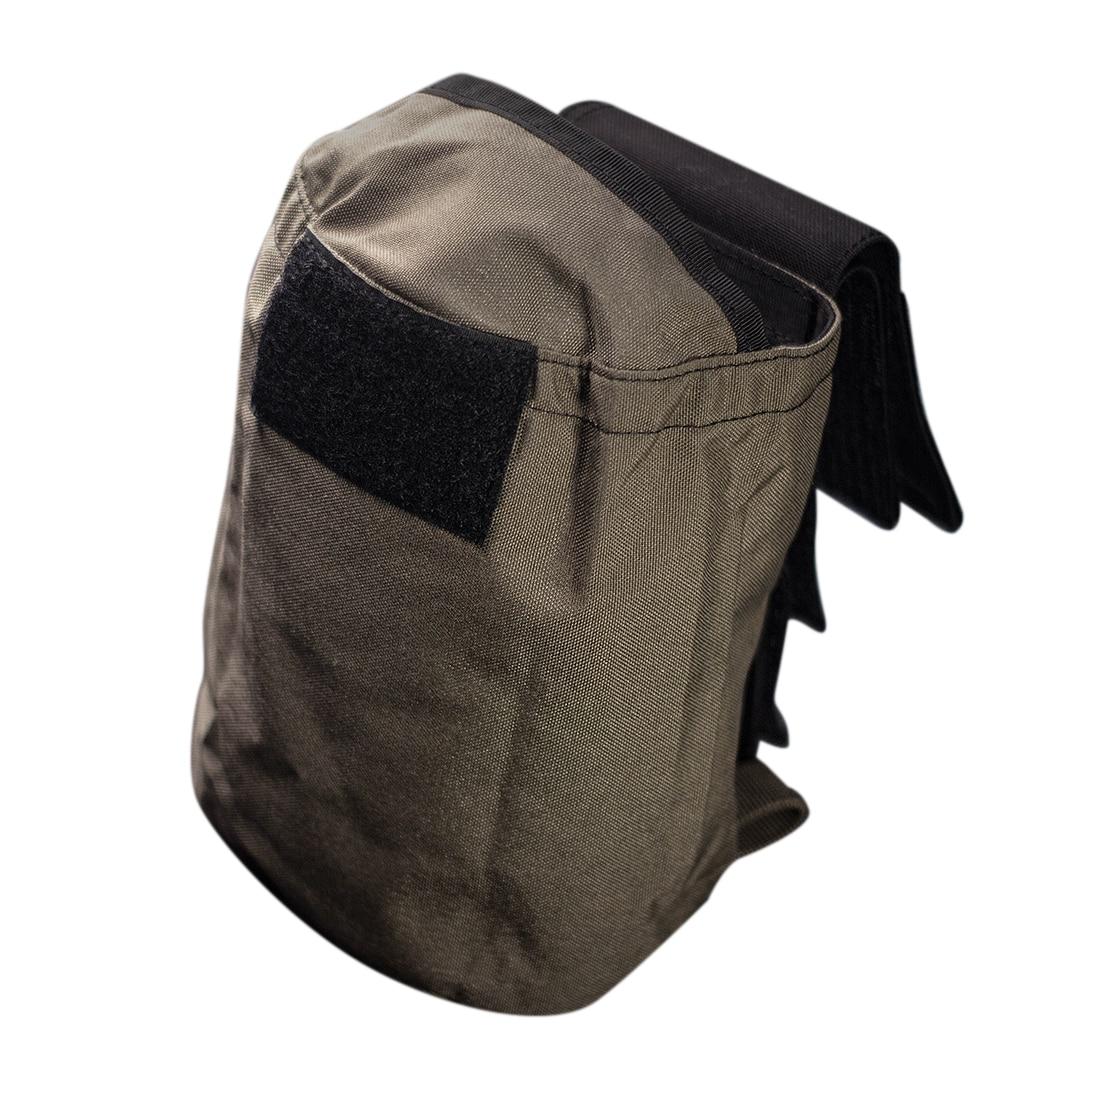 Dump Pouch Foldable Magazine Storage Bag Recycle Pouch - RG